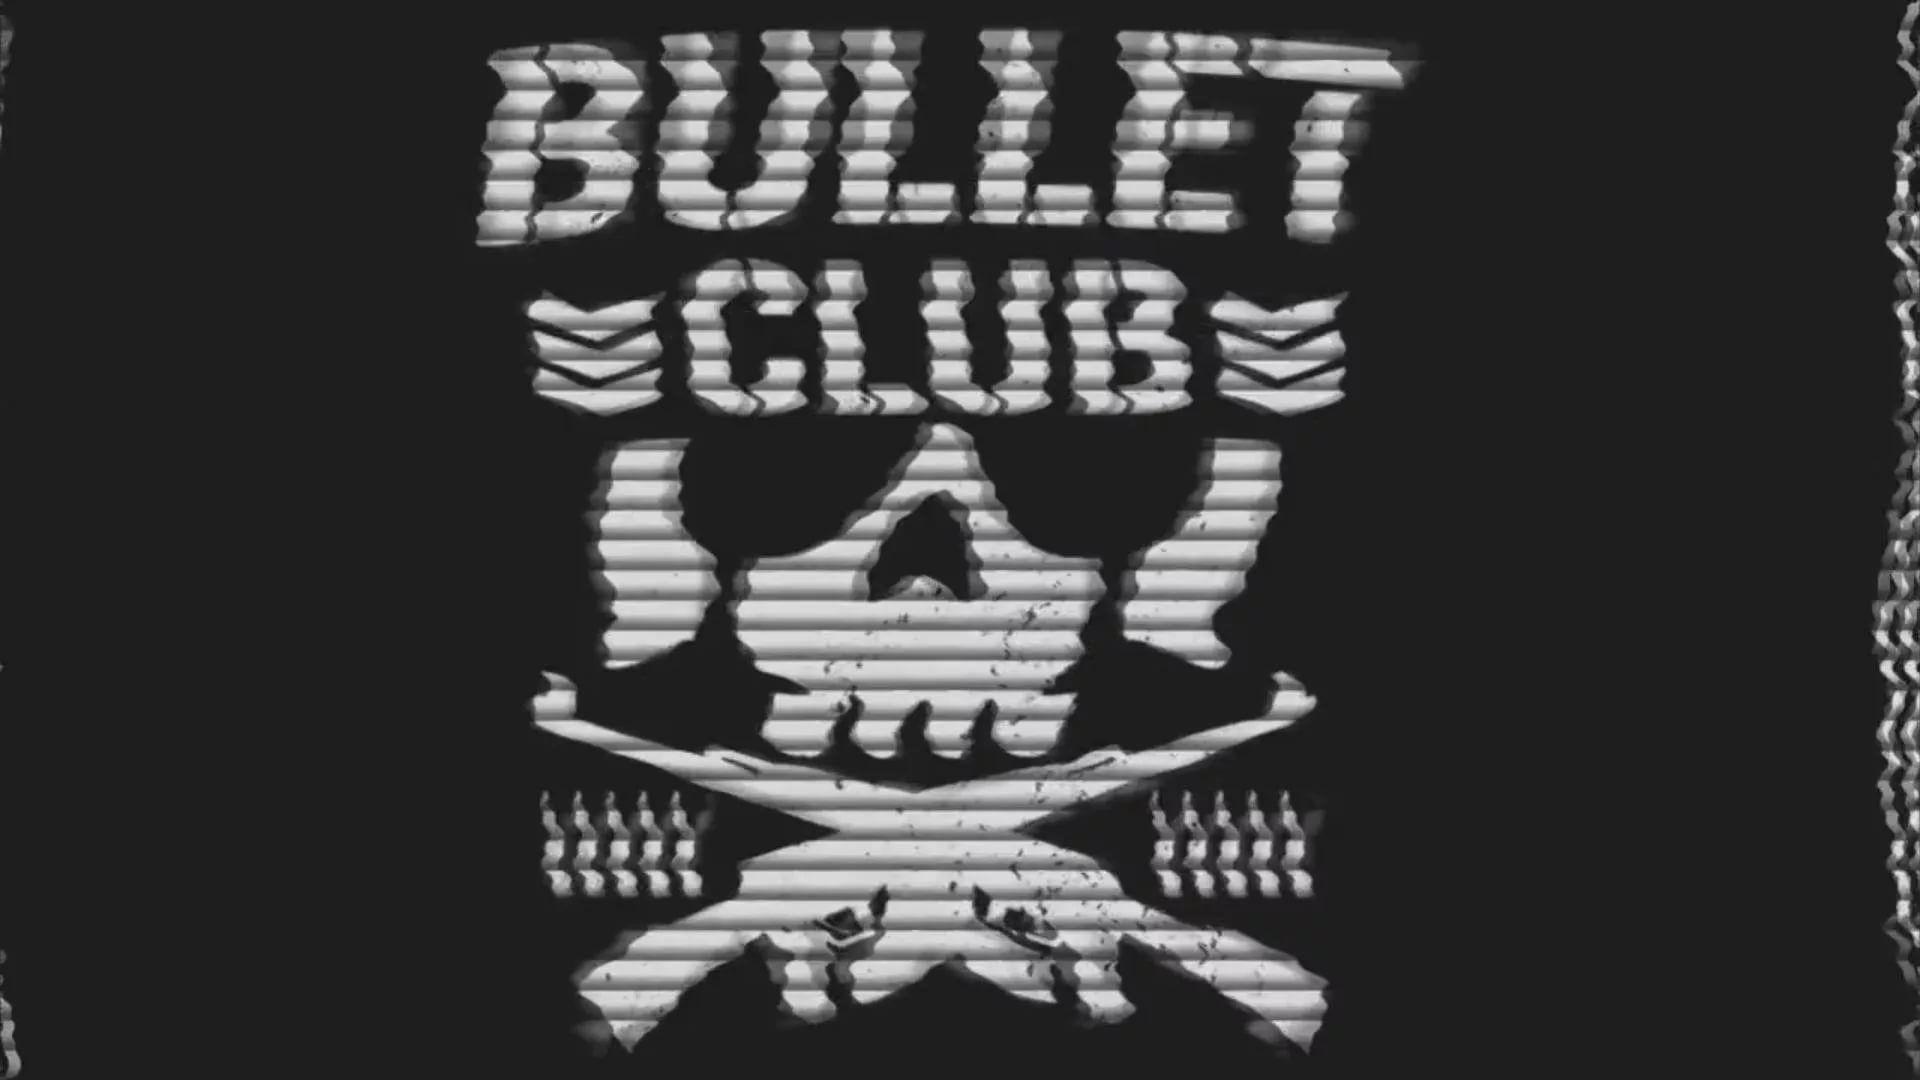 Bullet Club hd wallpaper 1080